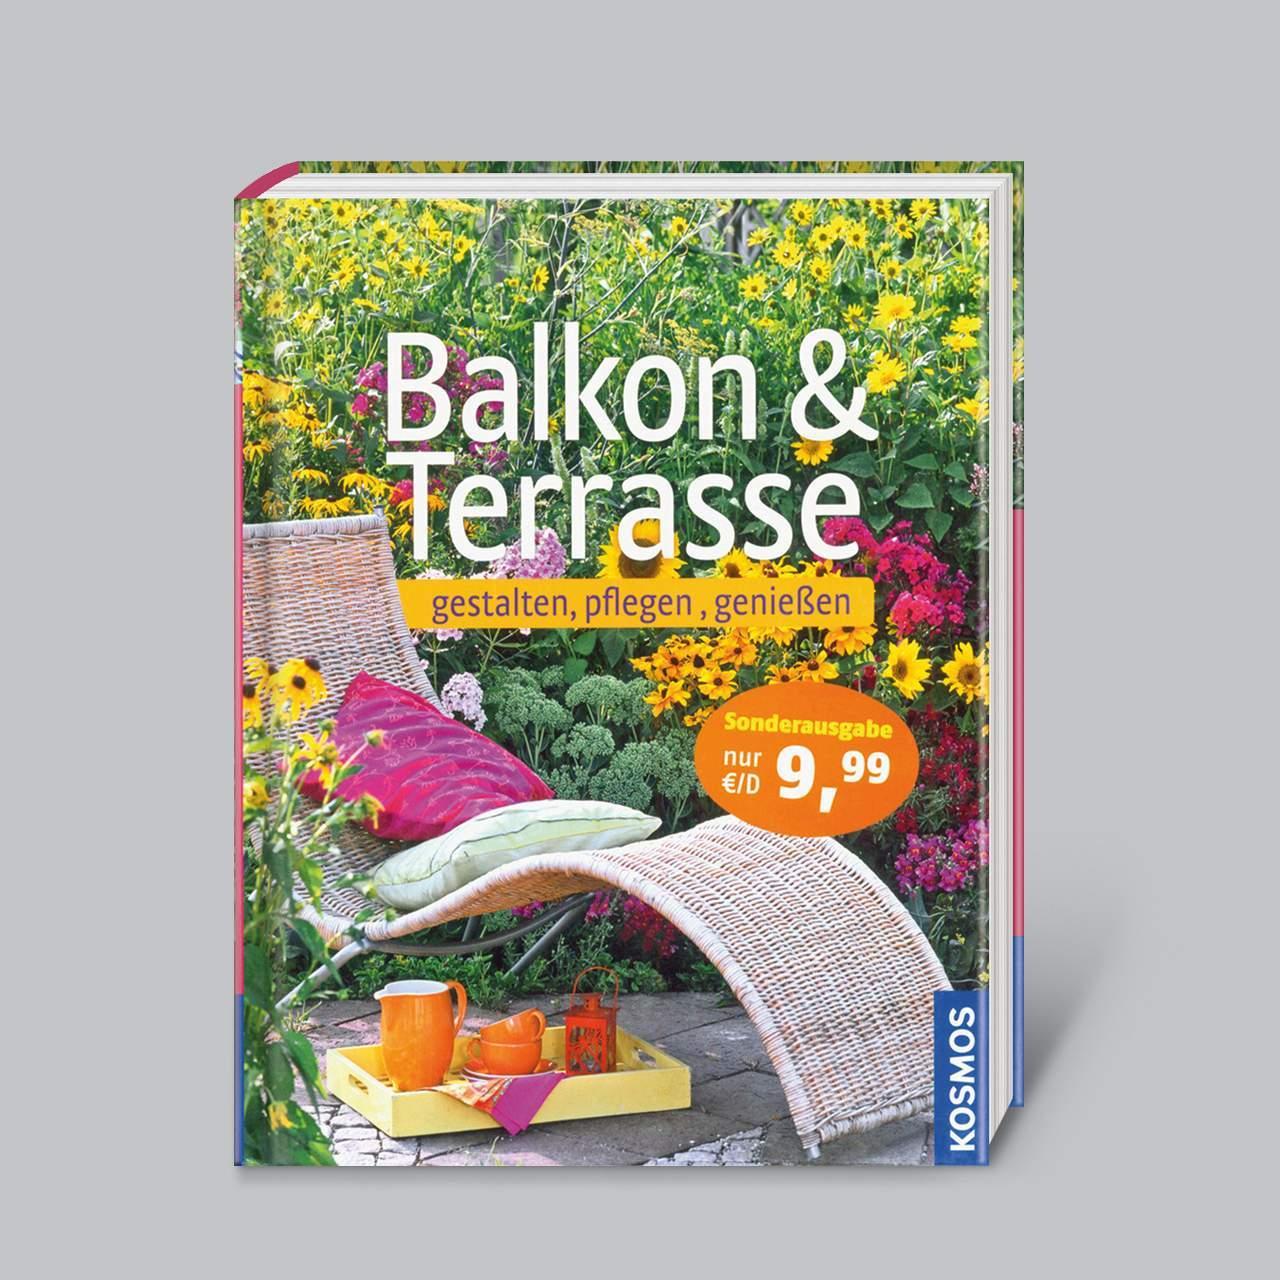 garten oase genial balkon and terrasse gestalten pflegen geniesen of garten oase